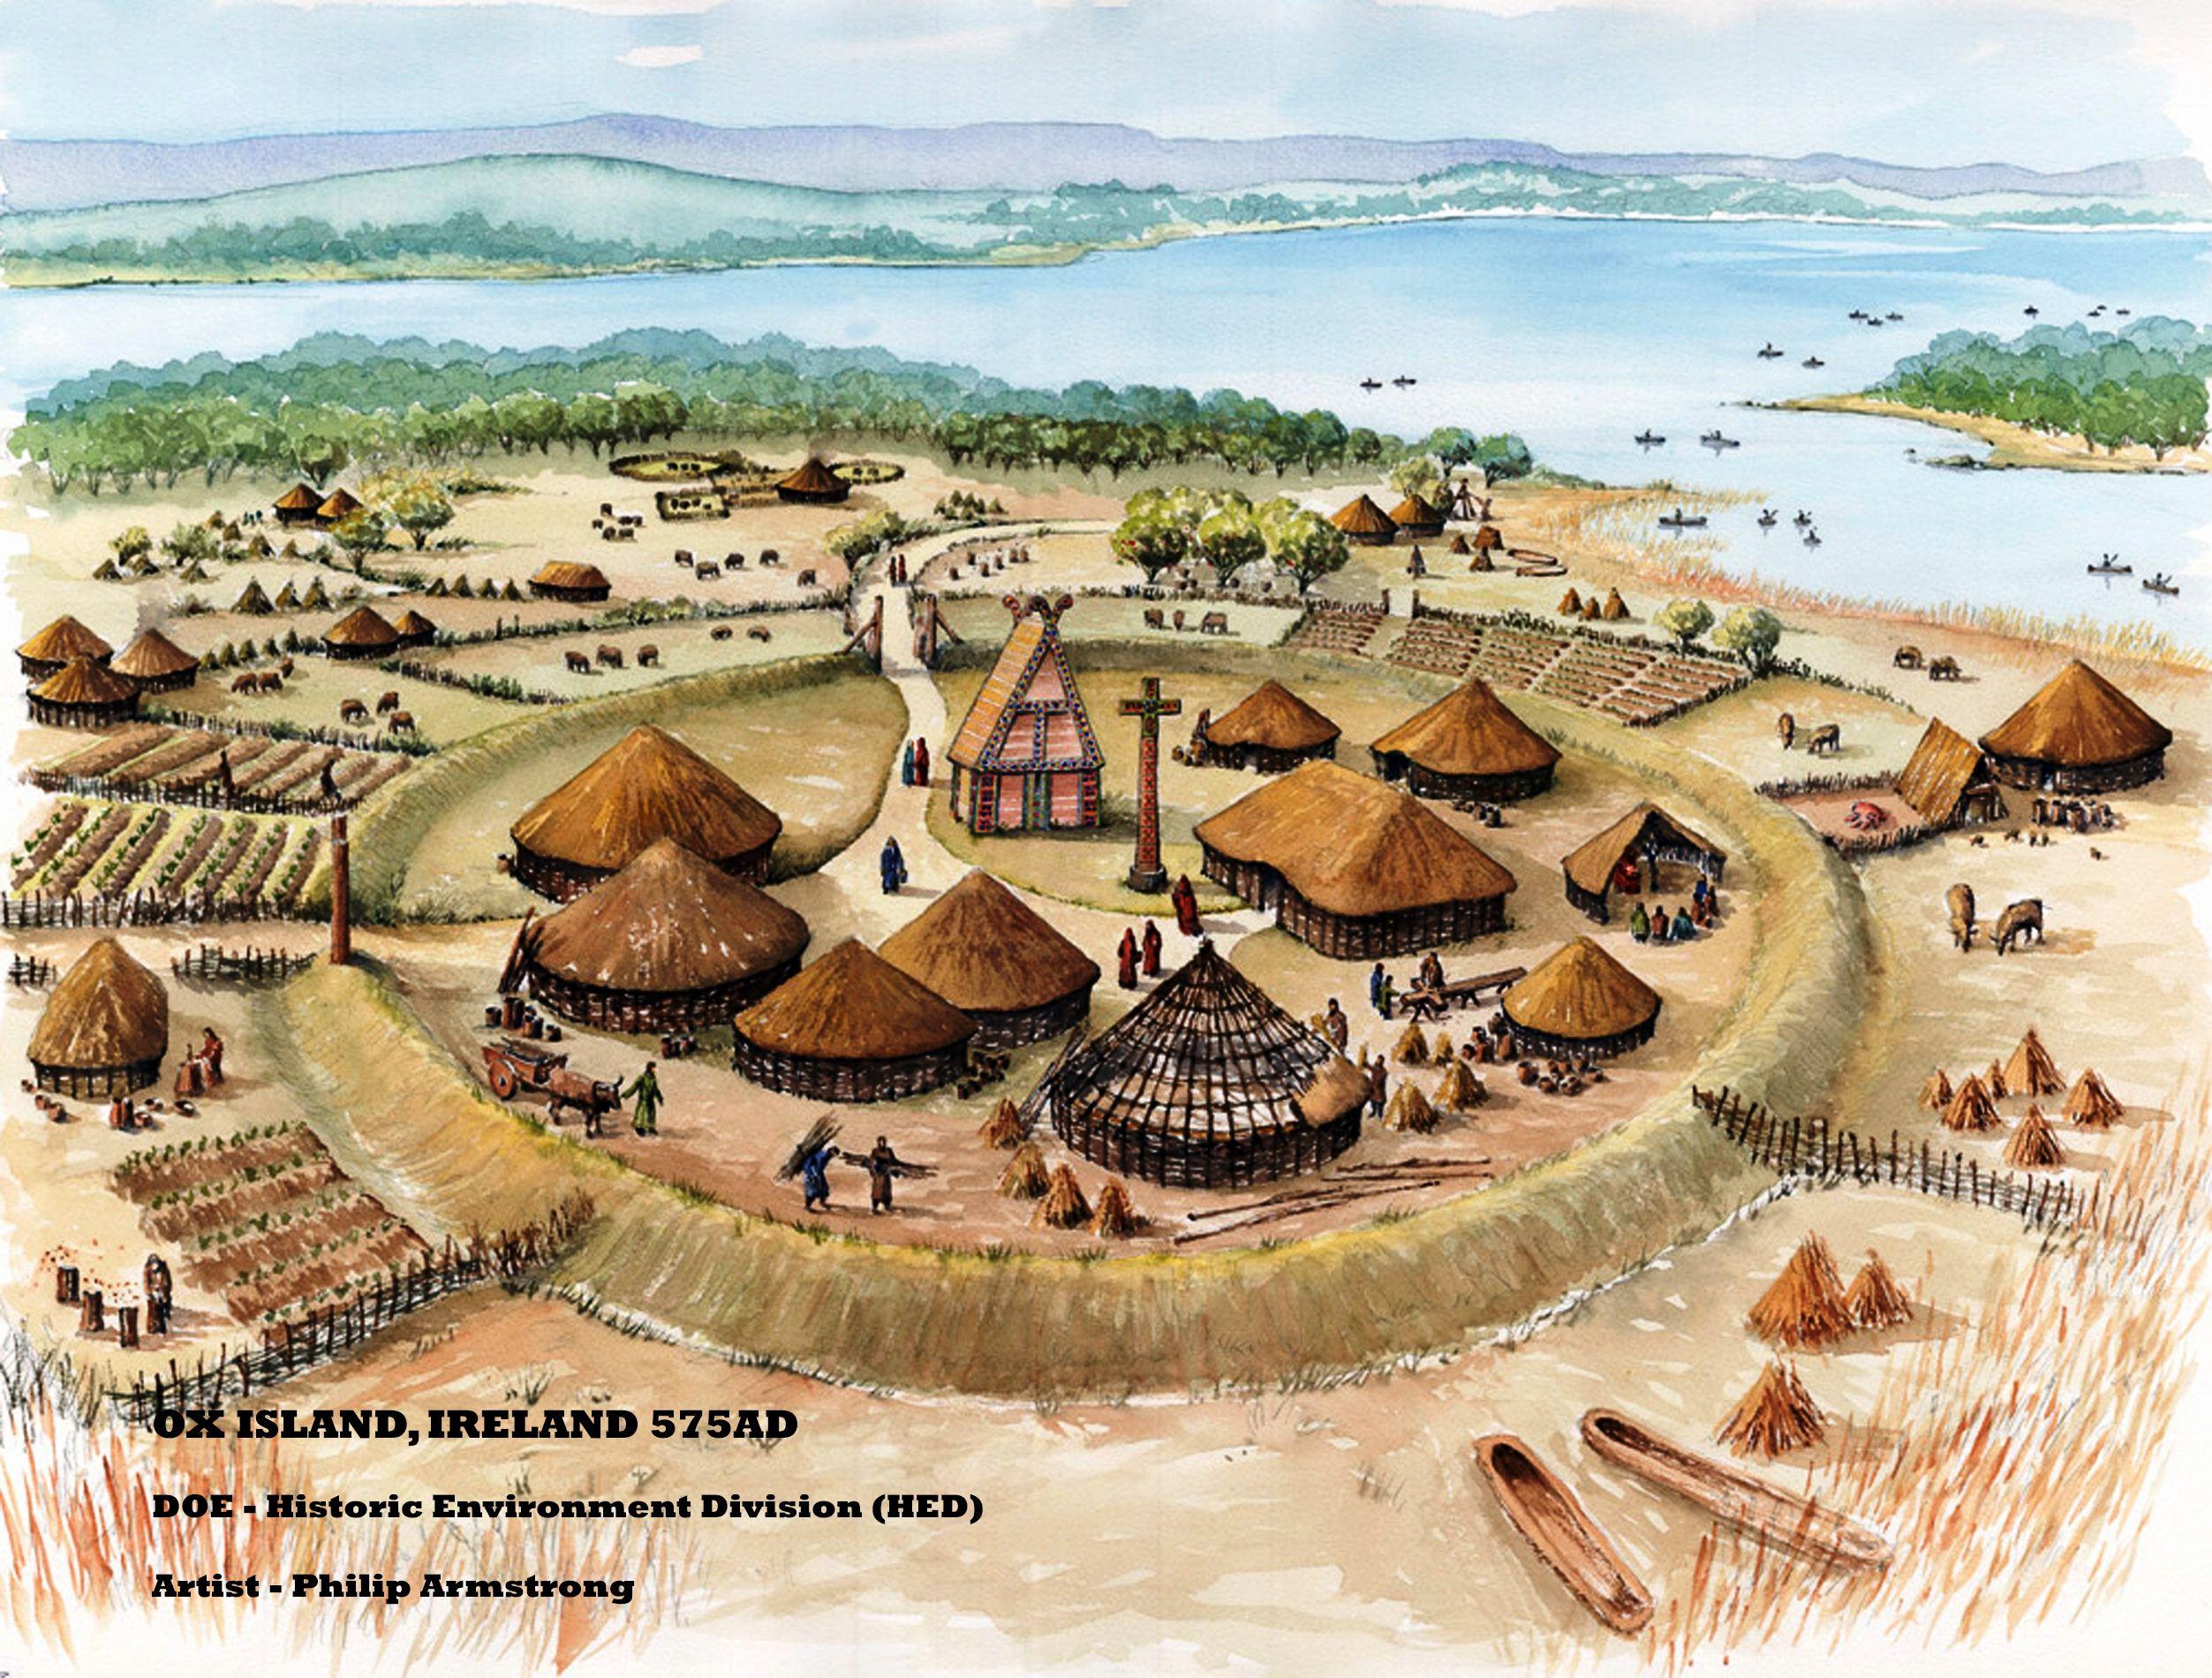 Ox Island Ireland 575ad Doe Historic Environment